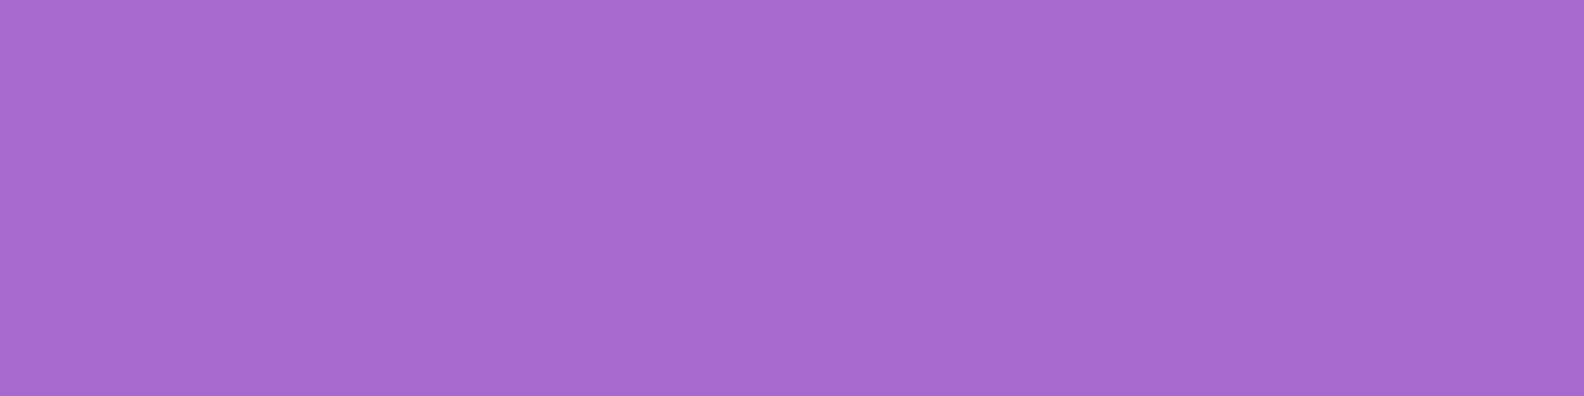 1584x396 Rich Lavender Solid Color Background